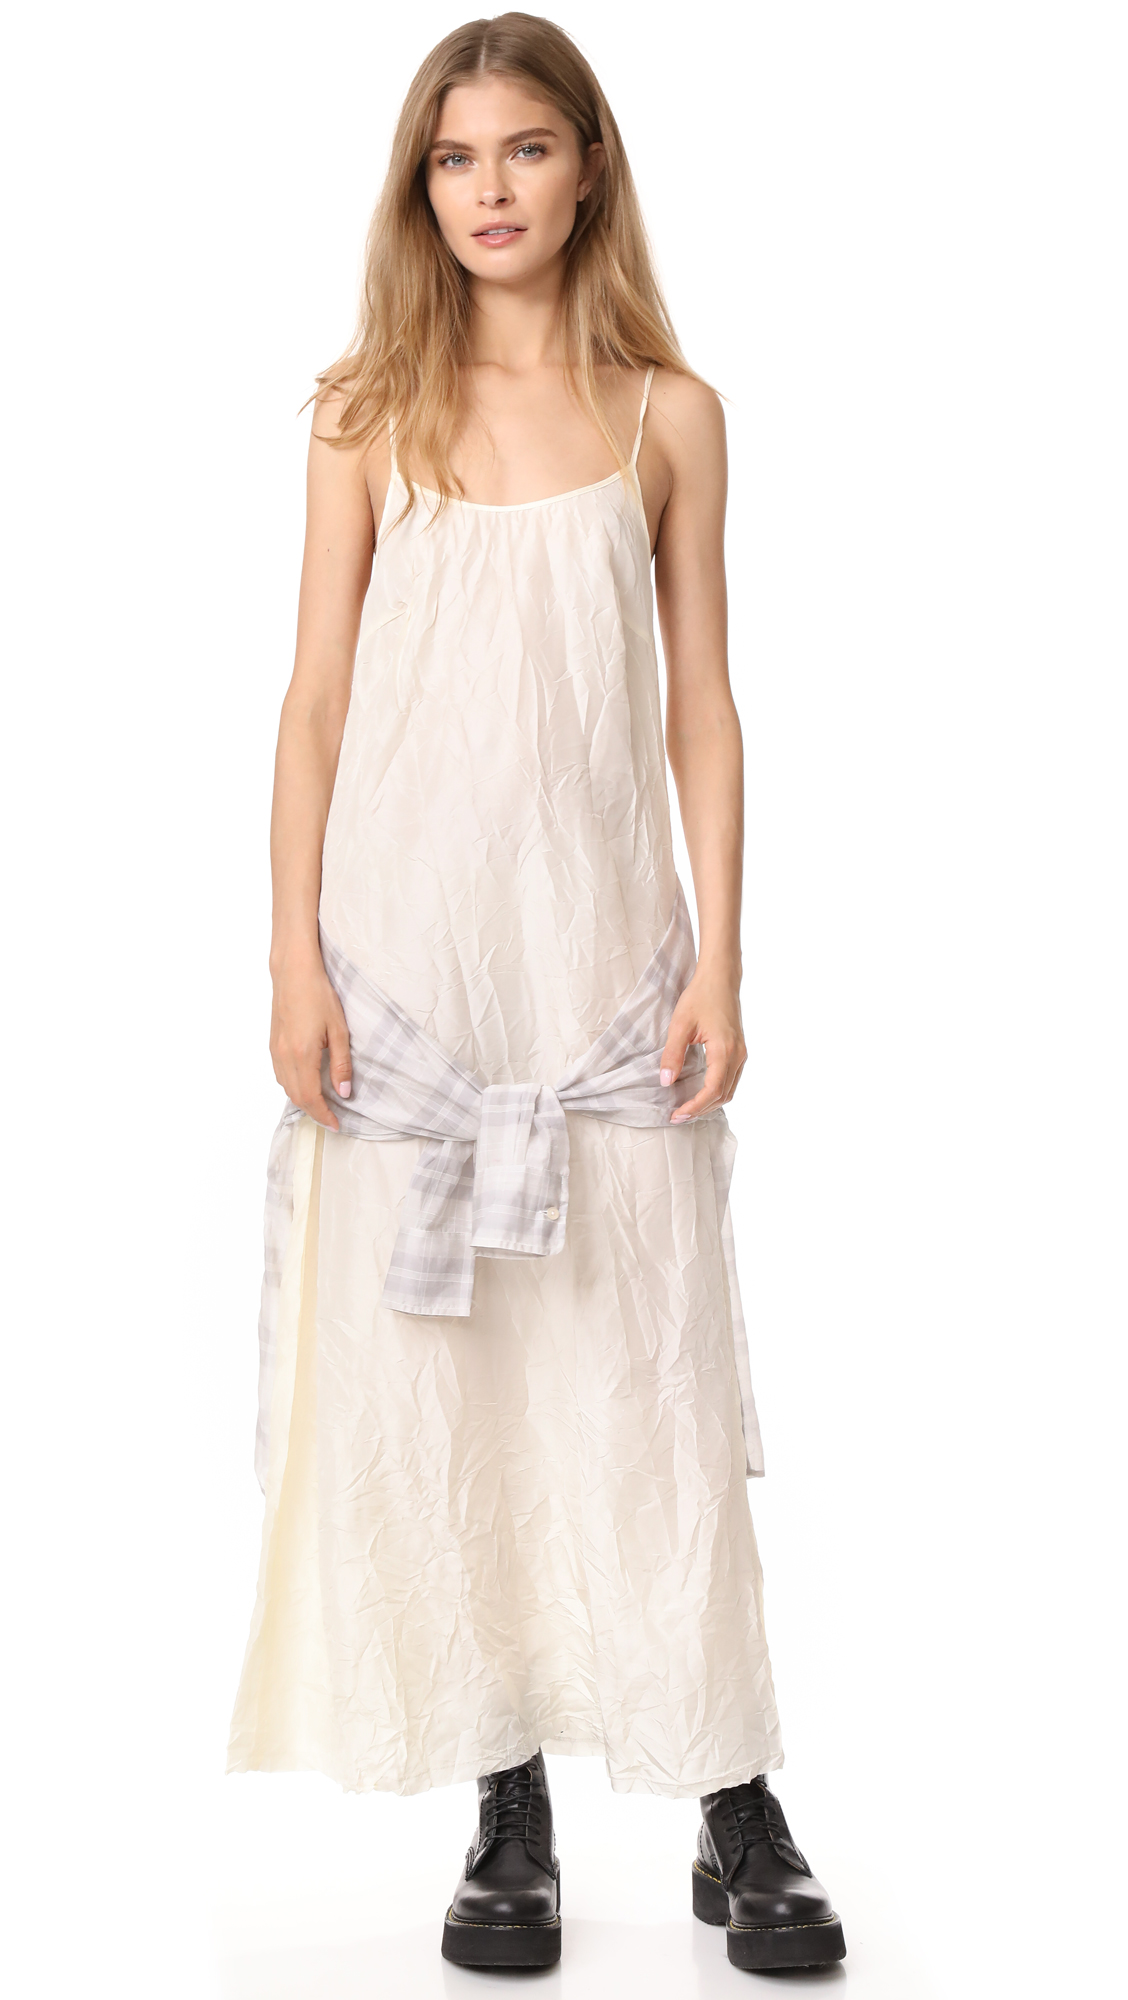 0a5bfe5934b R13 Summer Grunge Dress